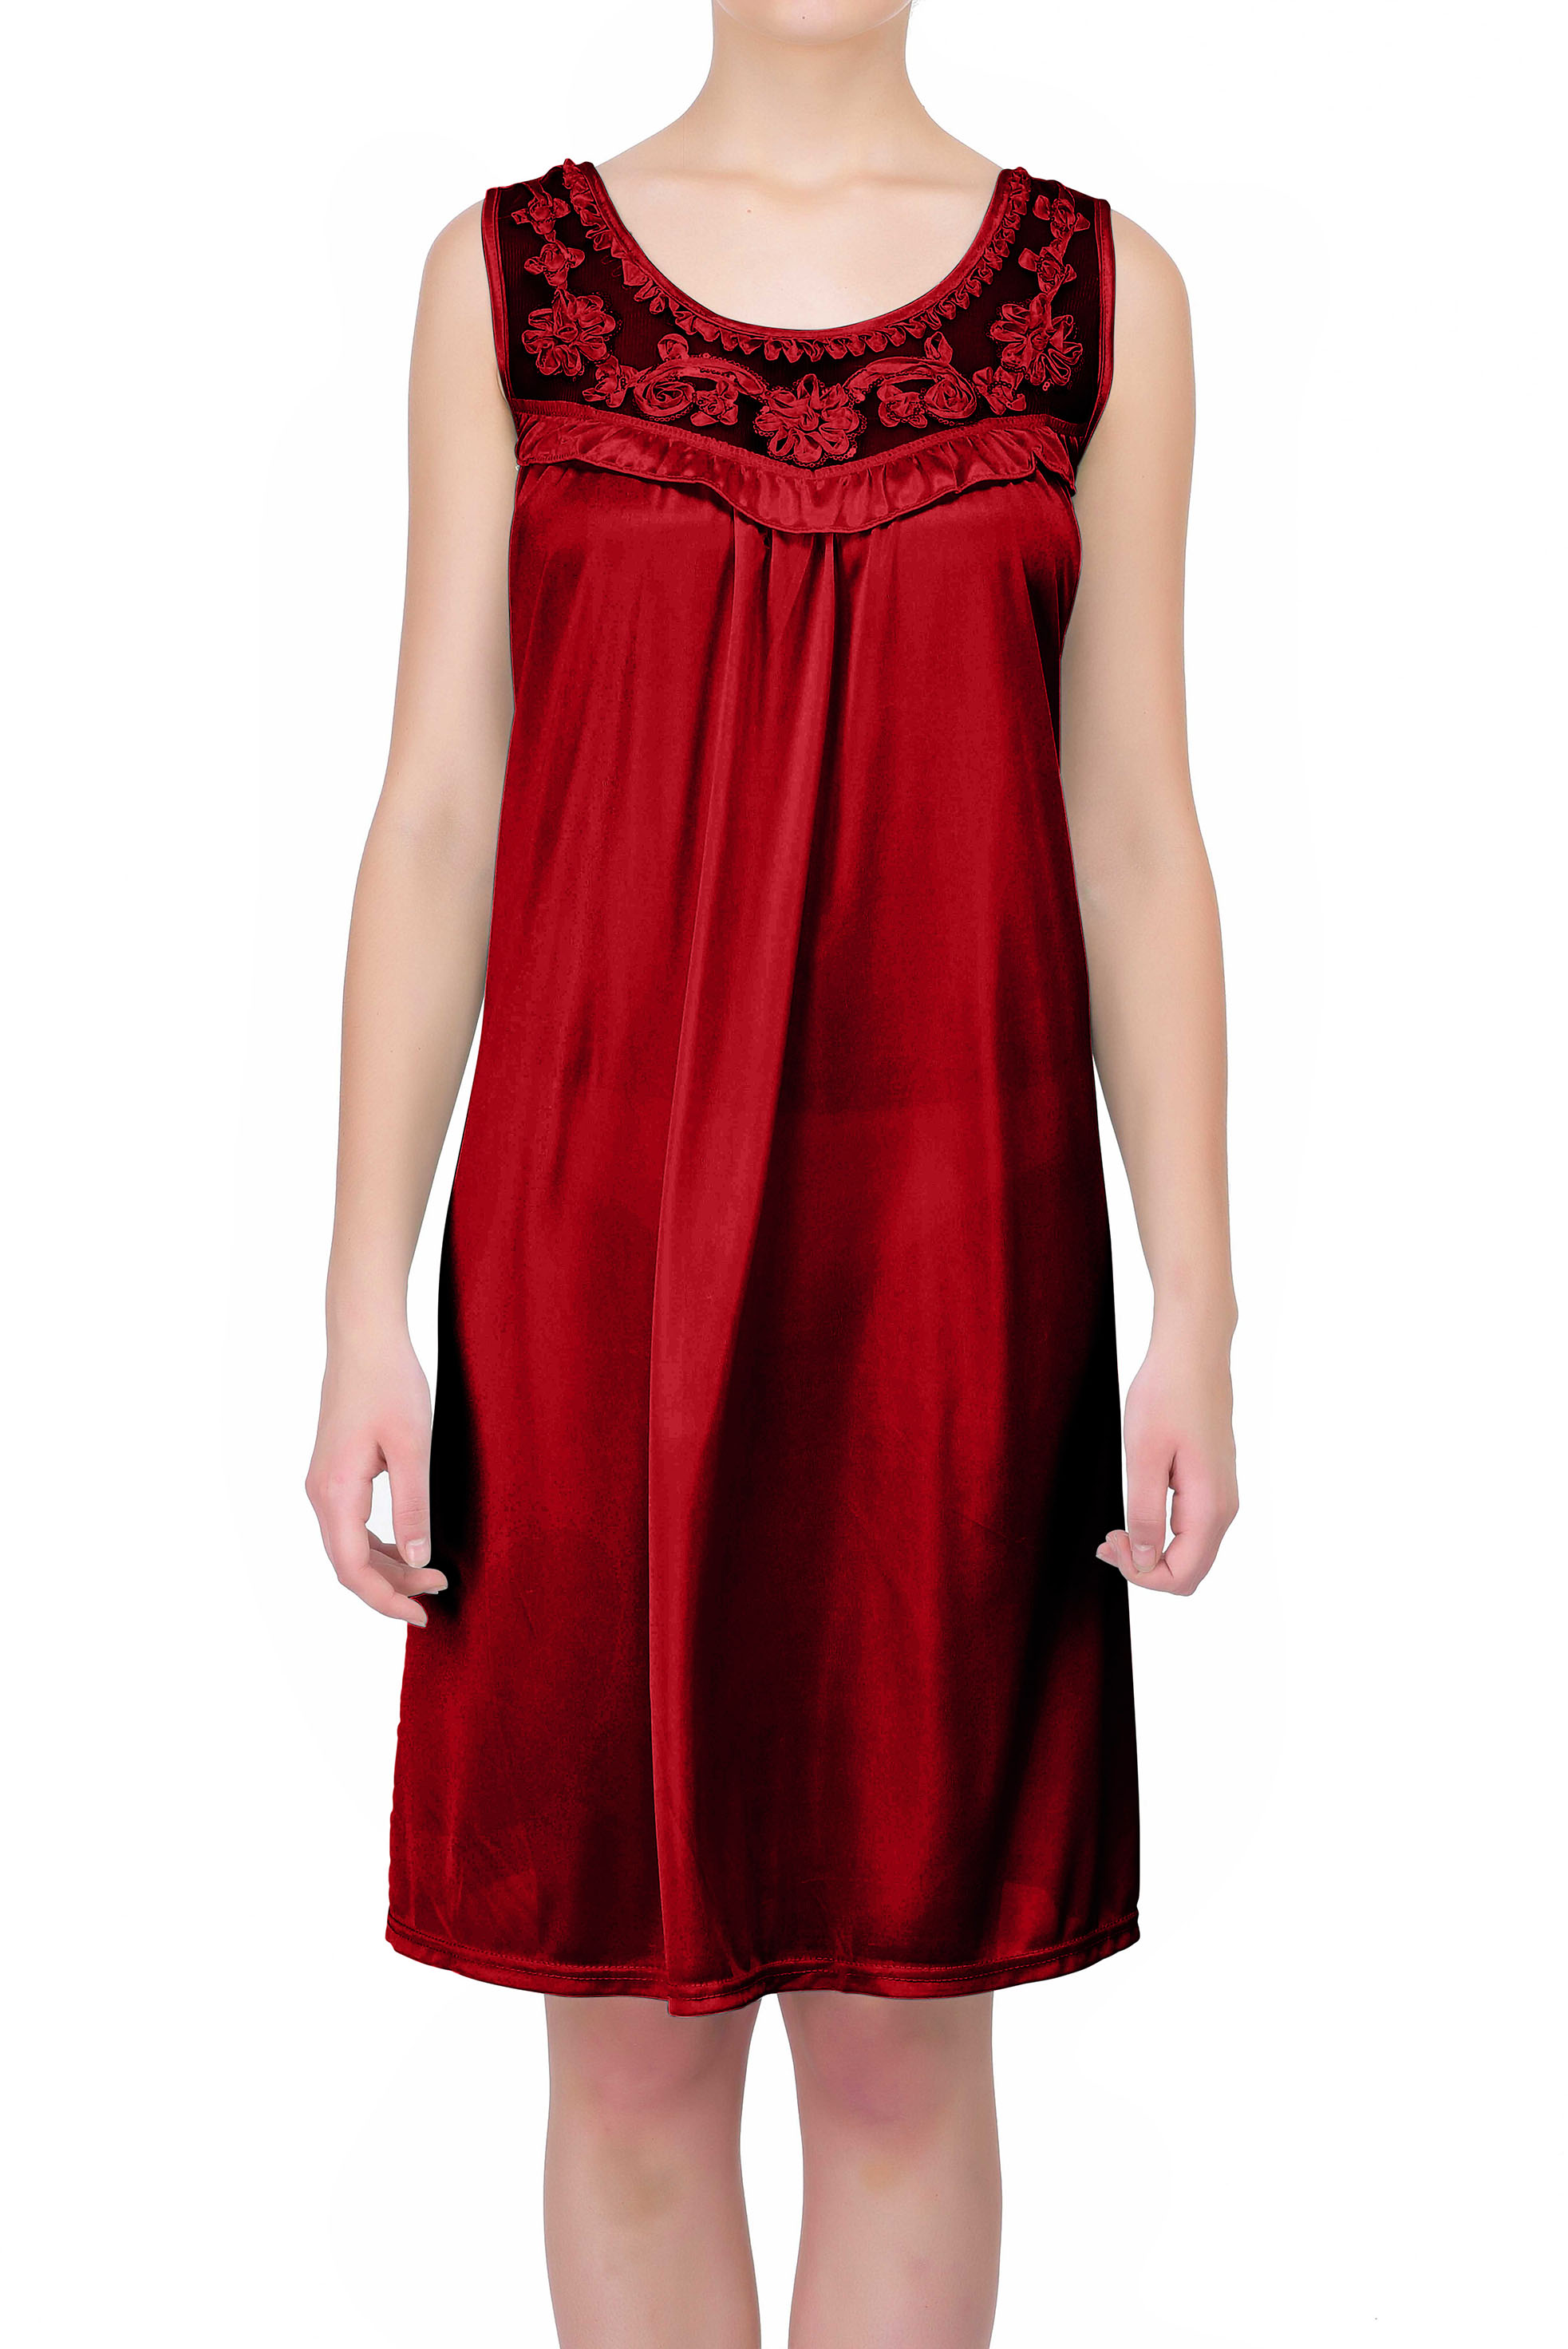 Women's Sheer Silky Sleeveless Nightgown by EZI